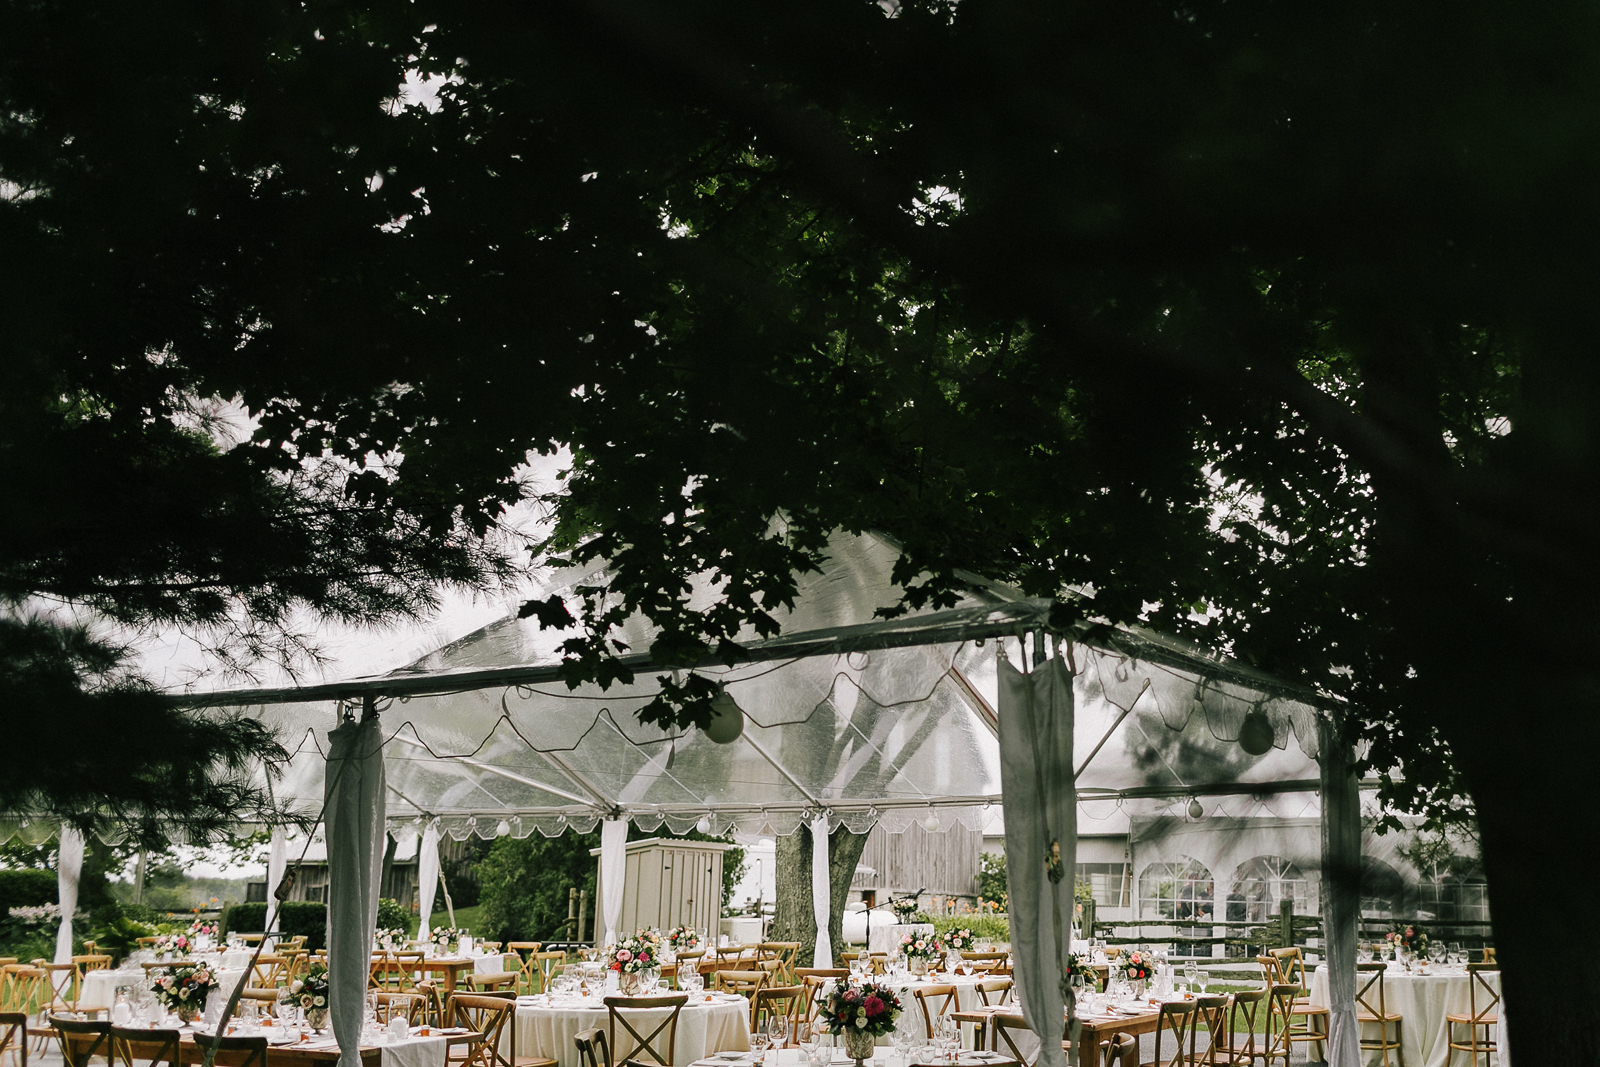 mike-and-jenni-wedding-307.jpg